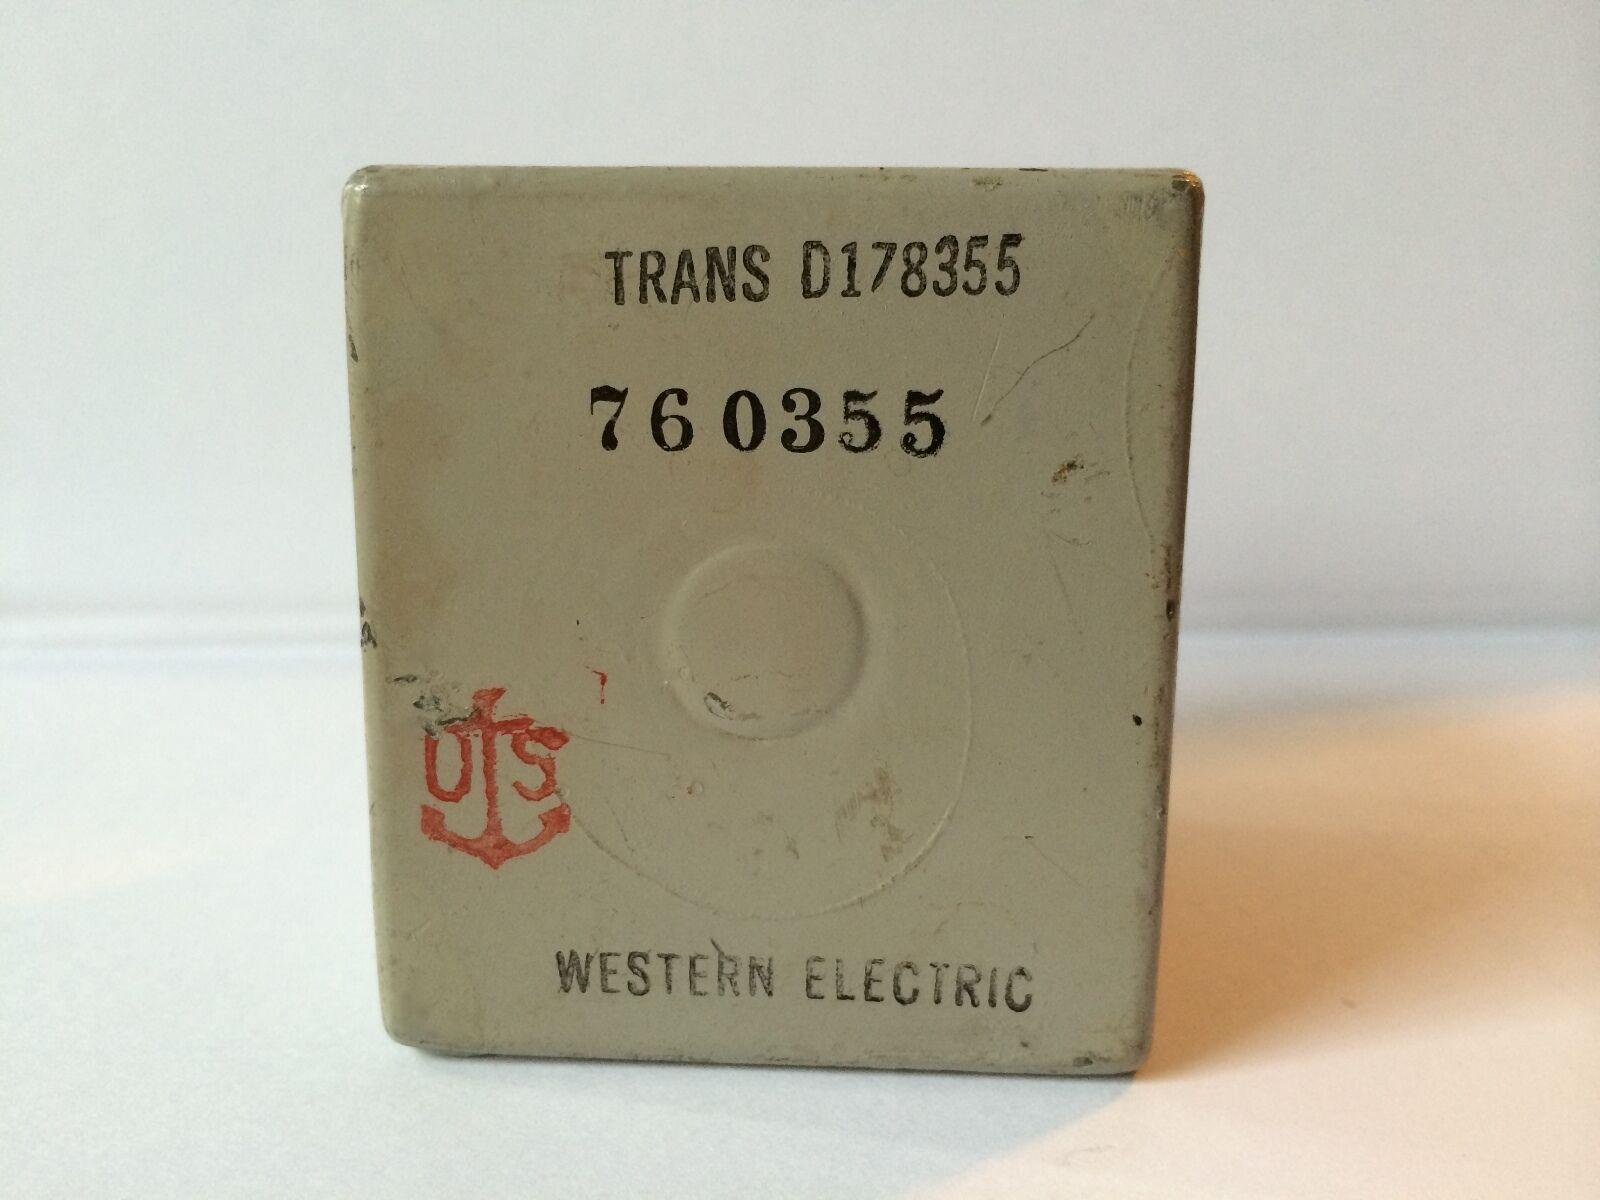 Western Electric Electric Electric Transformador UTC Triad Thordarson  mejor oferta